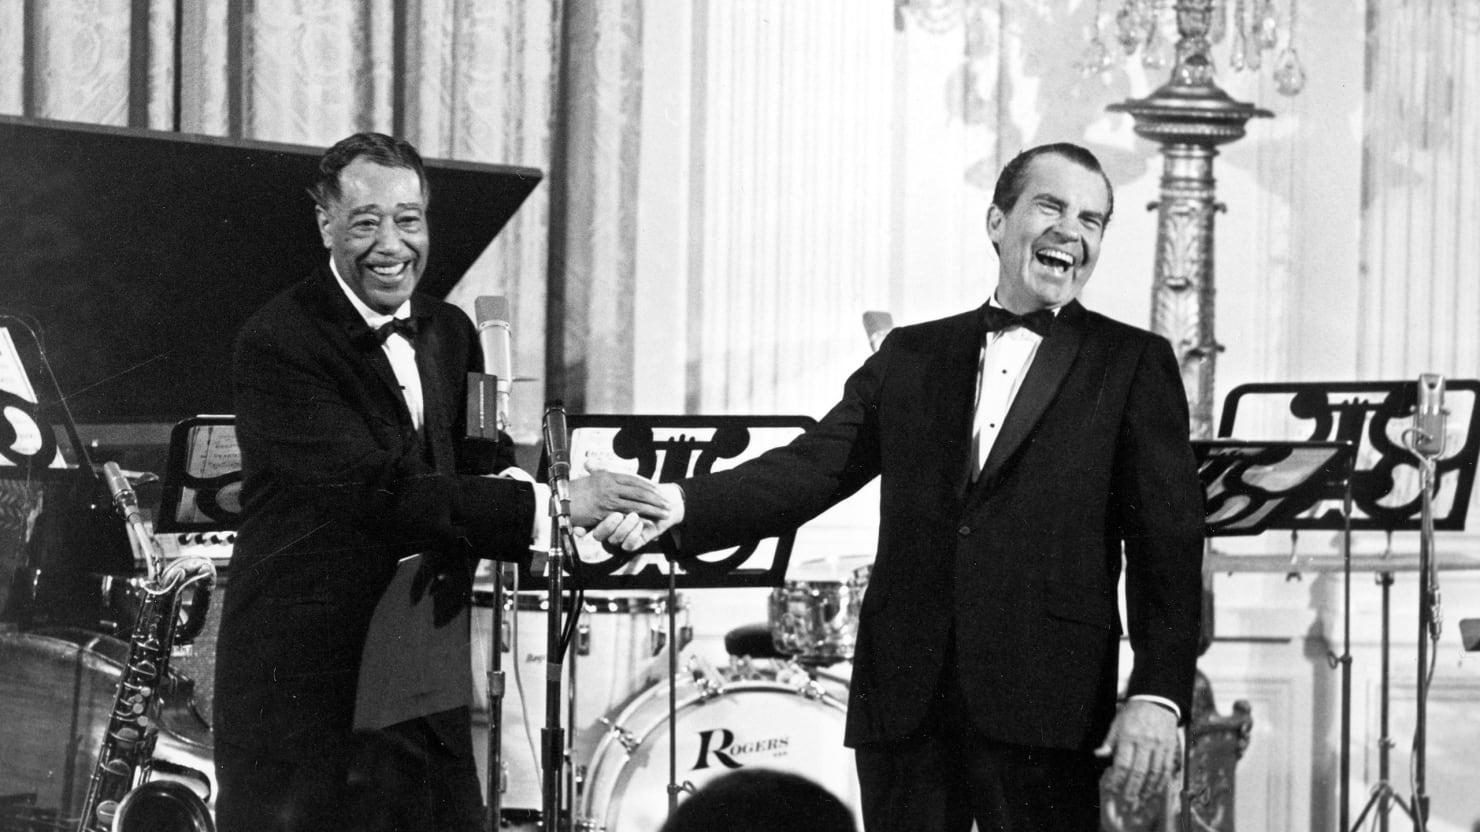 How I've Learned to Appreciate Nixon